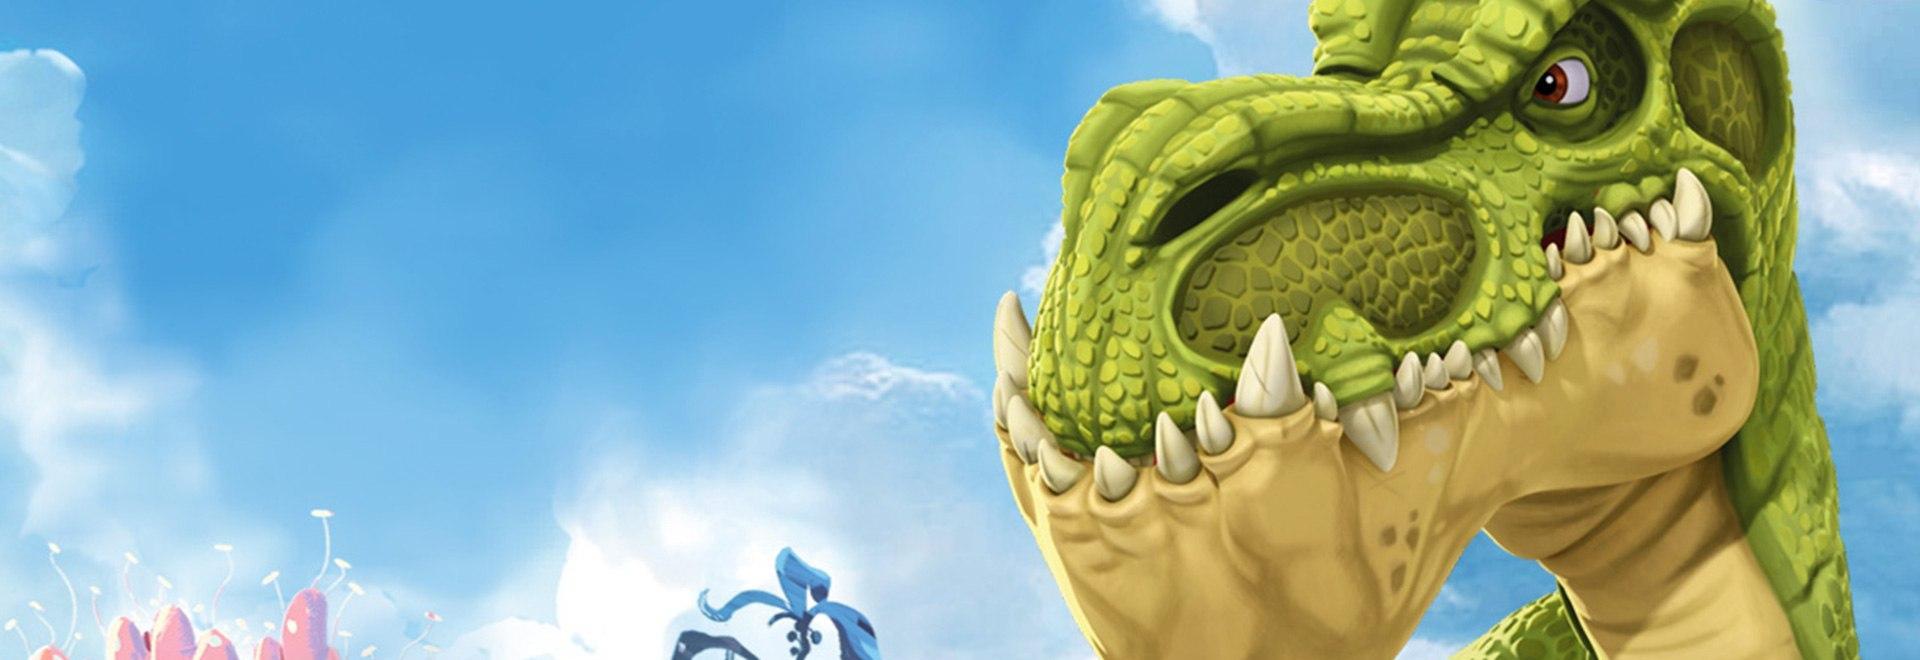 Gigantosaurus - Stag. 1 Ep. 13 - Talento-sauro / Marsh il raptor